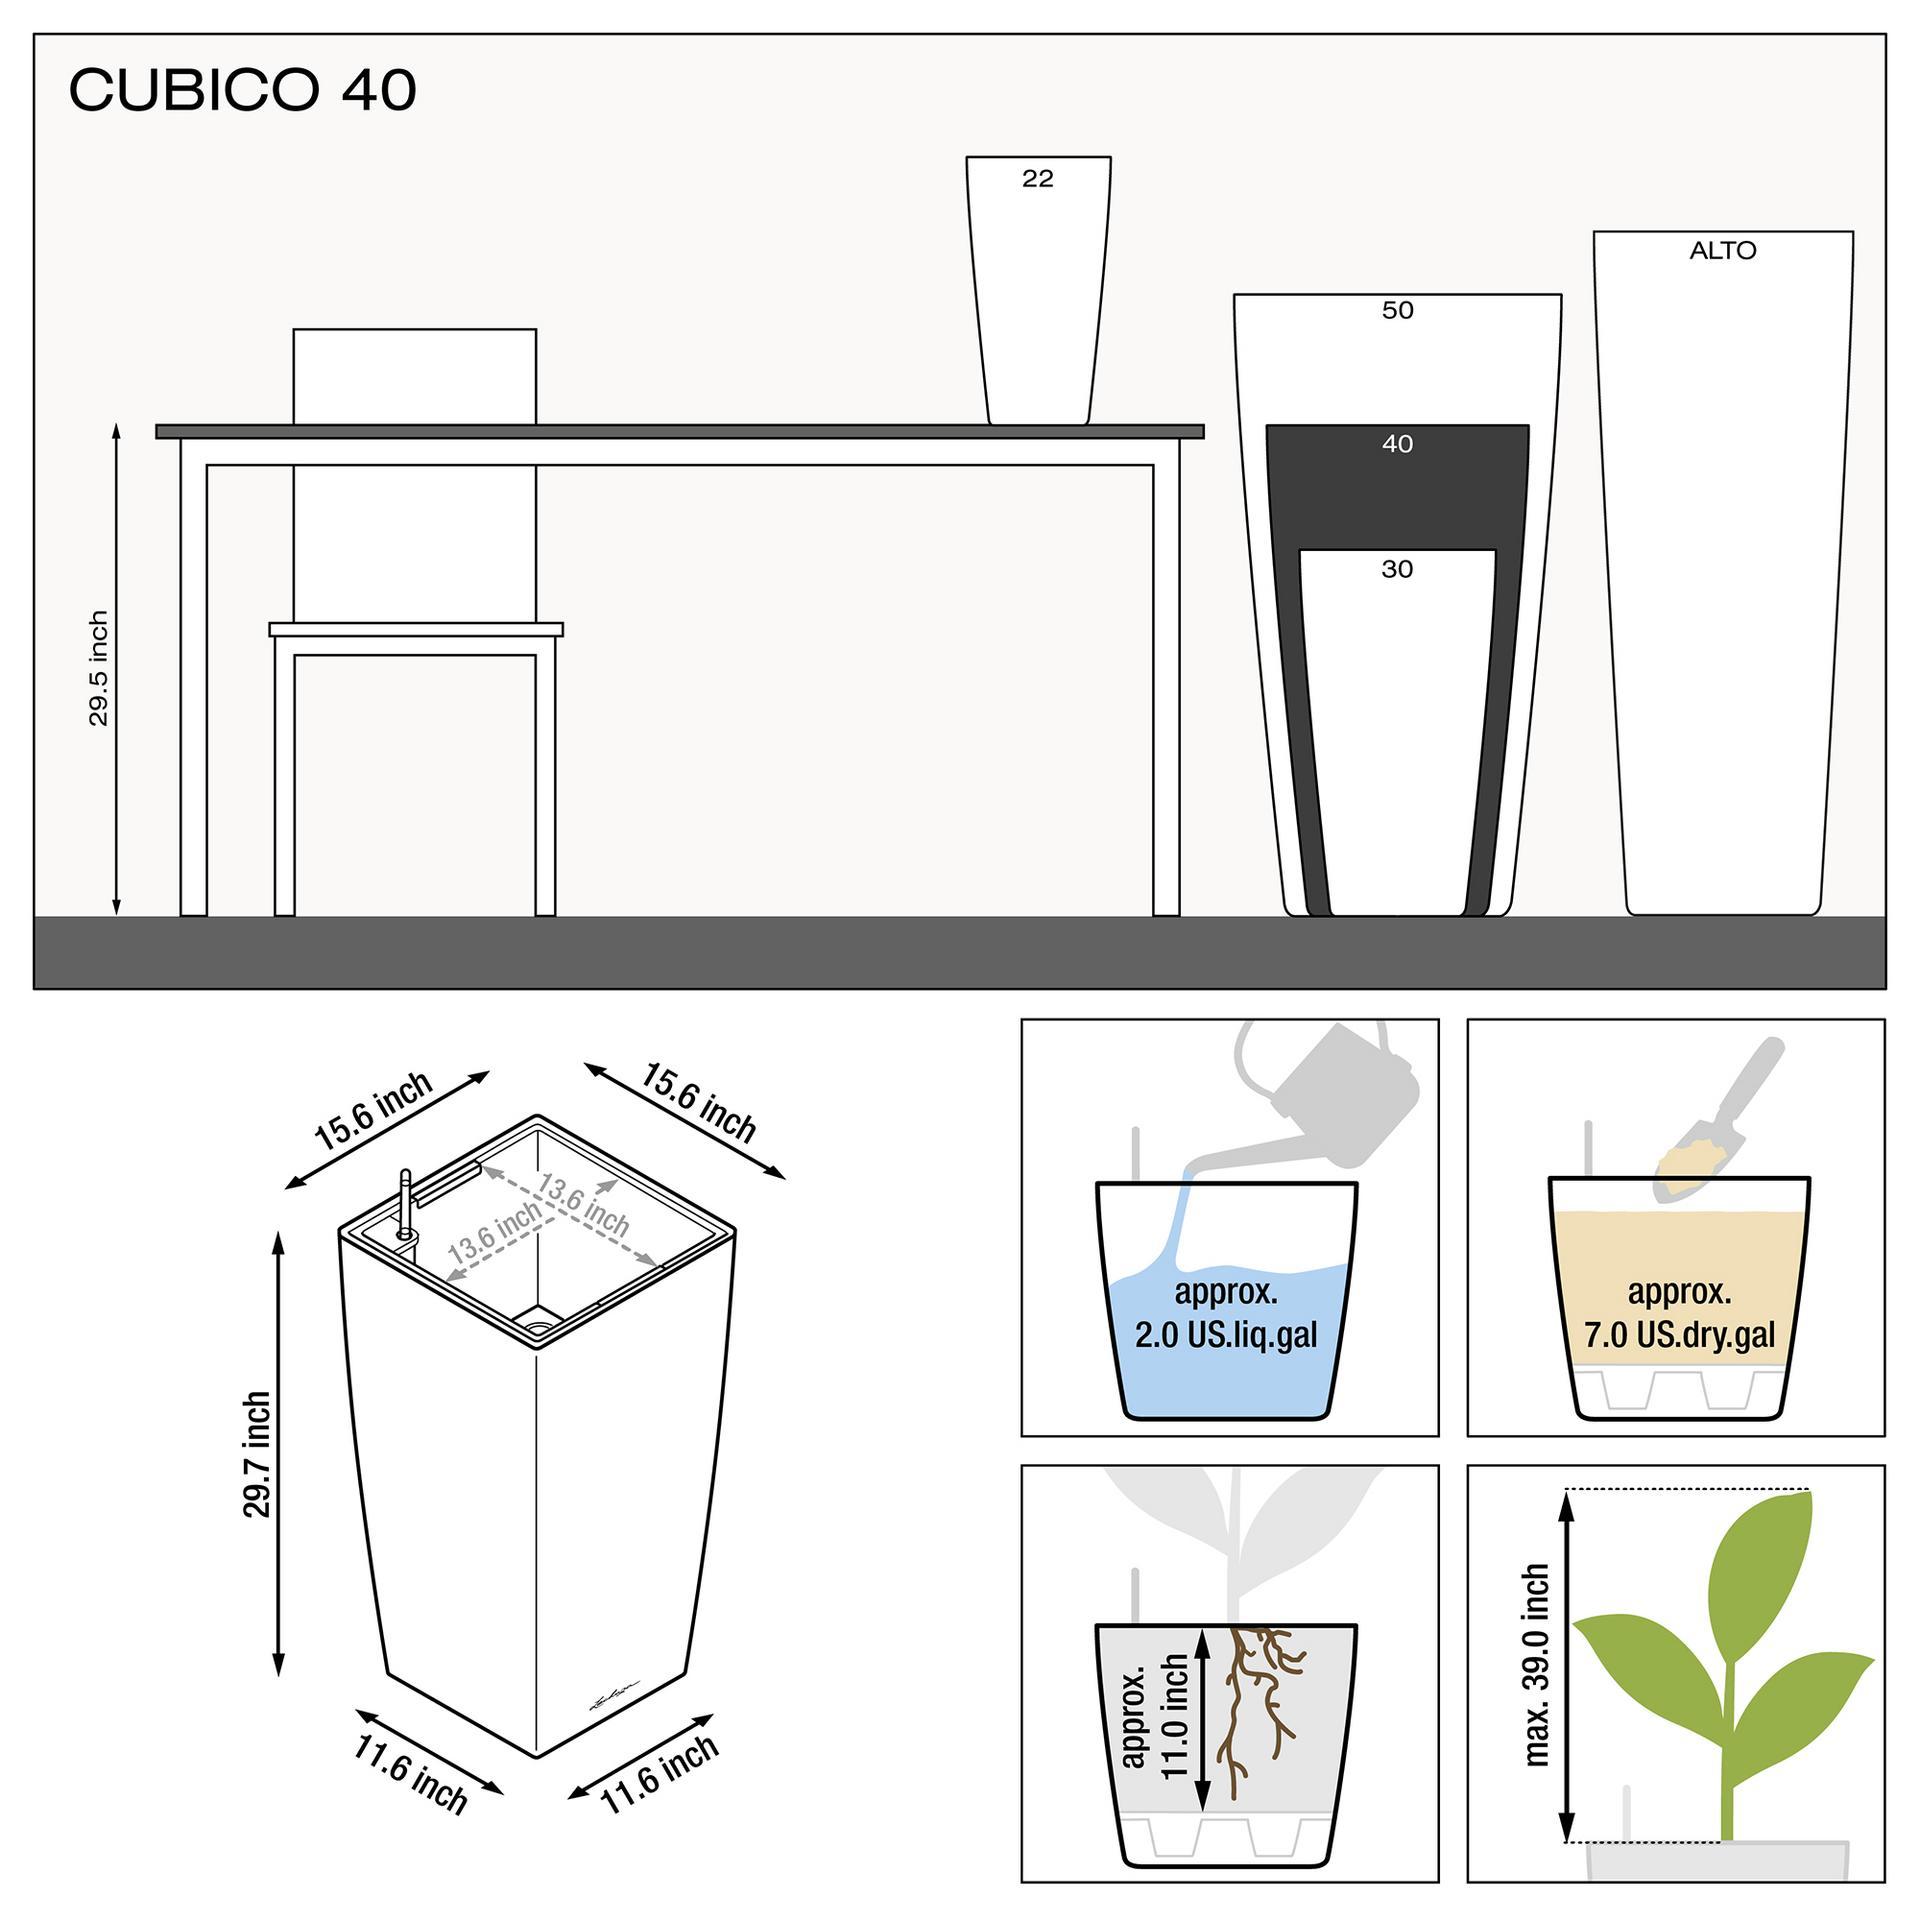 le_cubico40_product_addi_nz_us